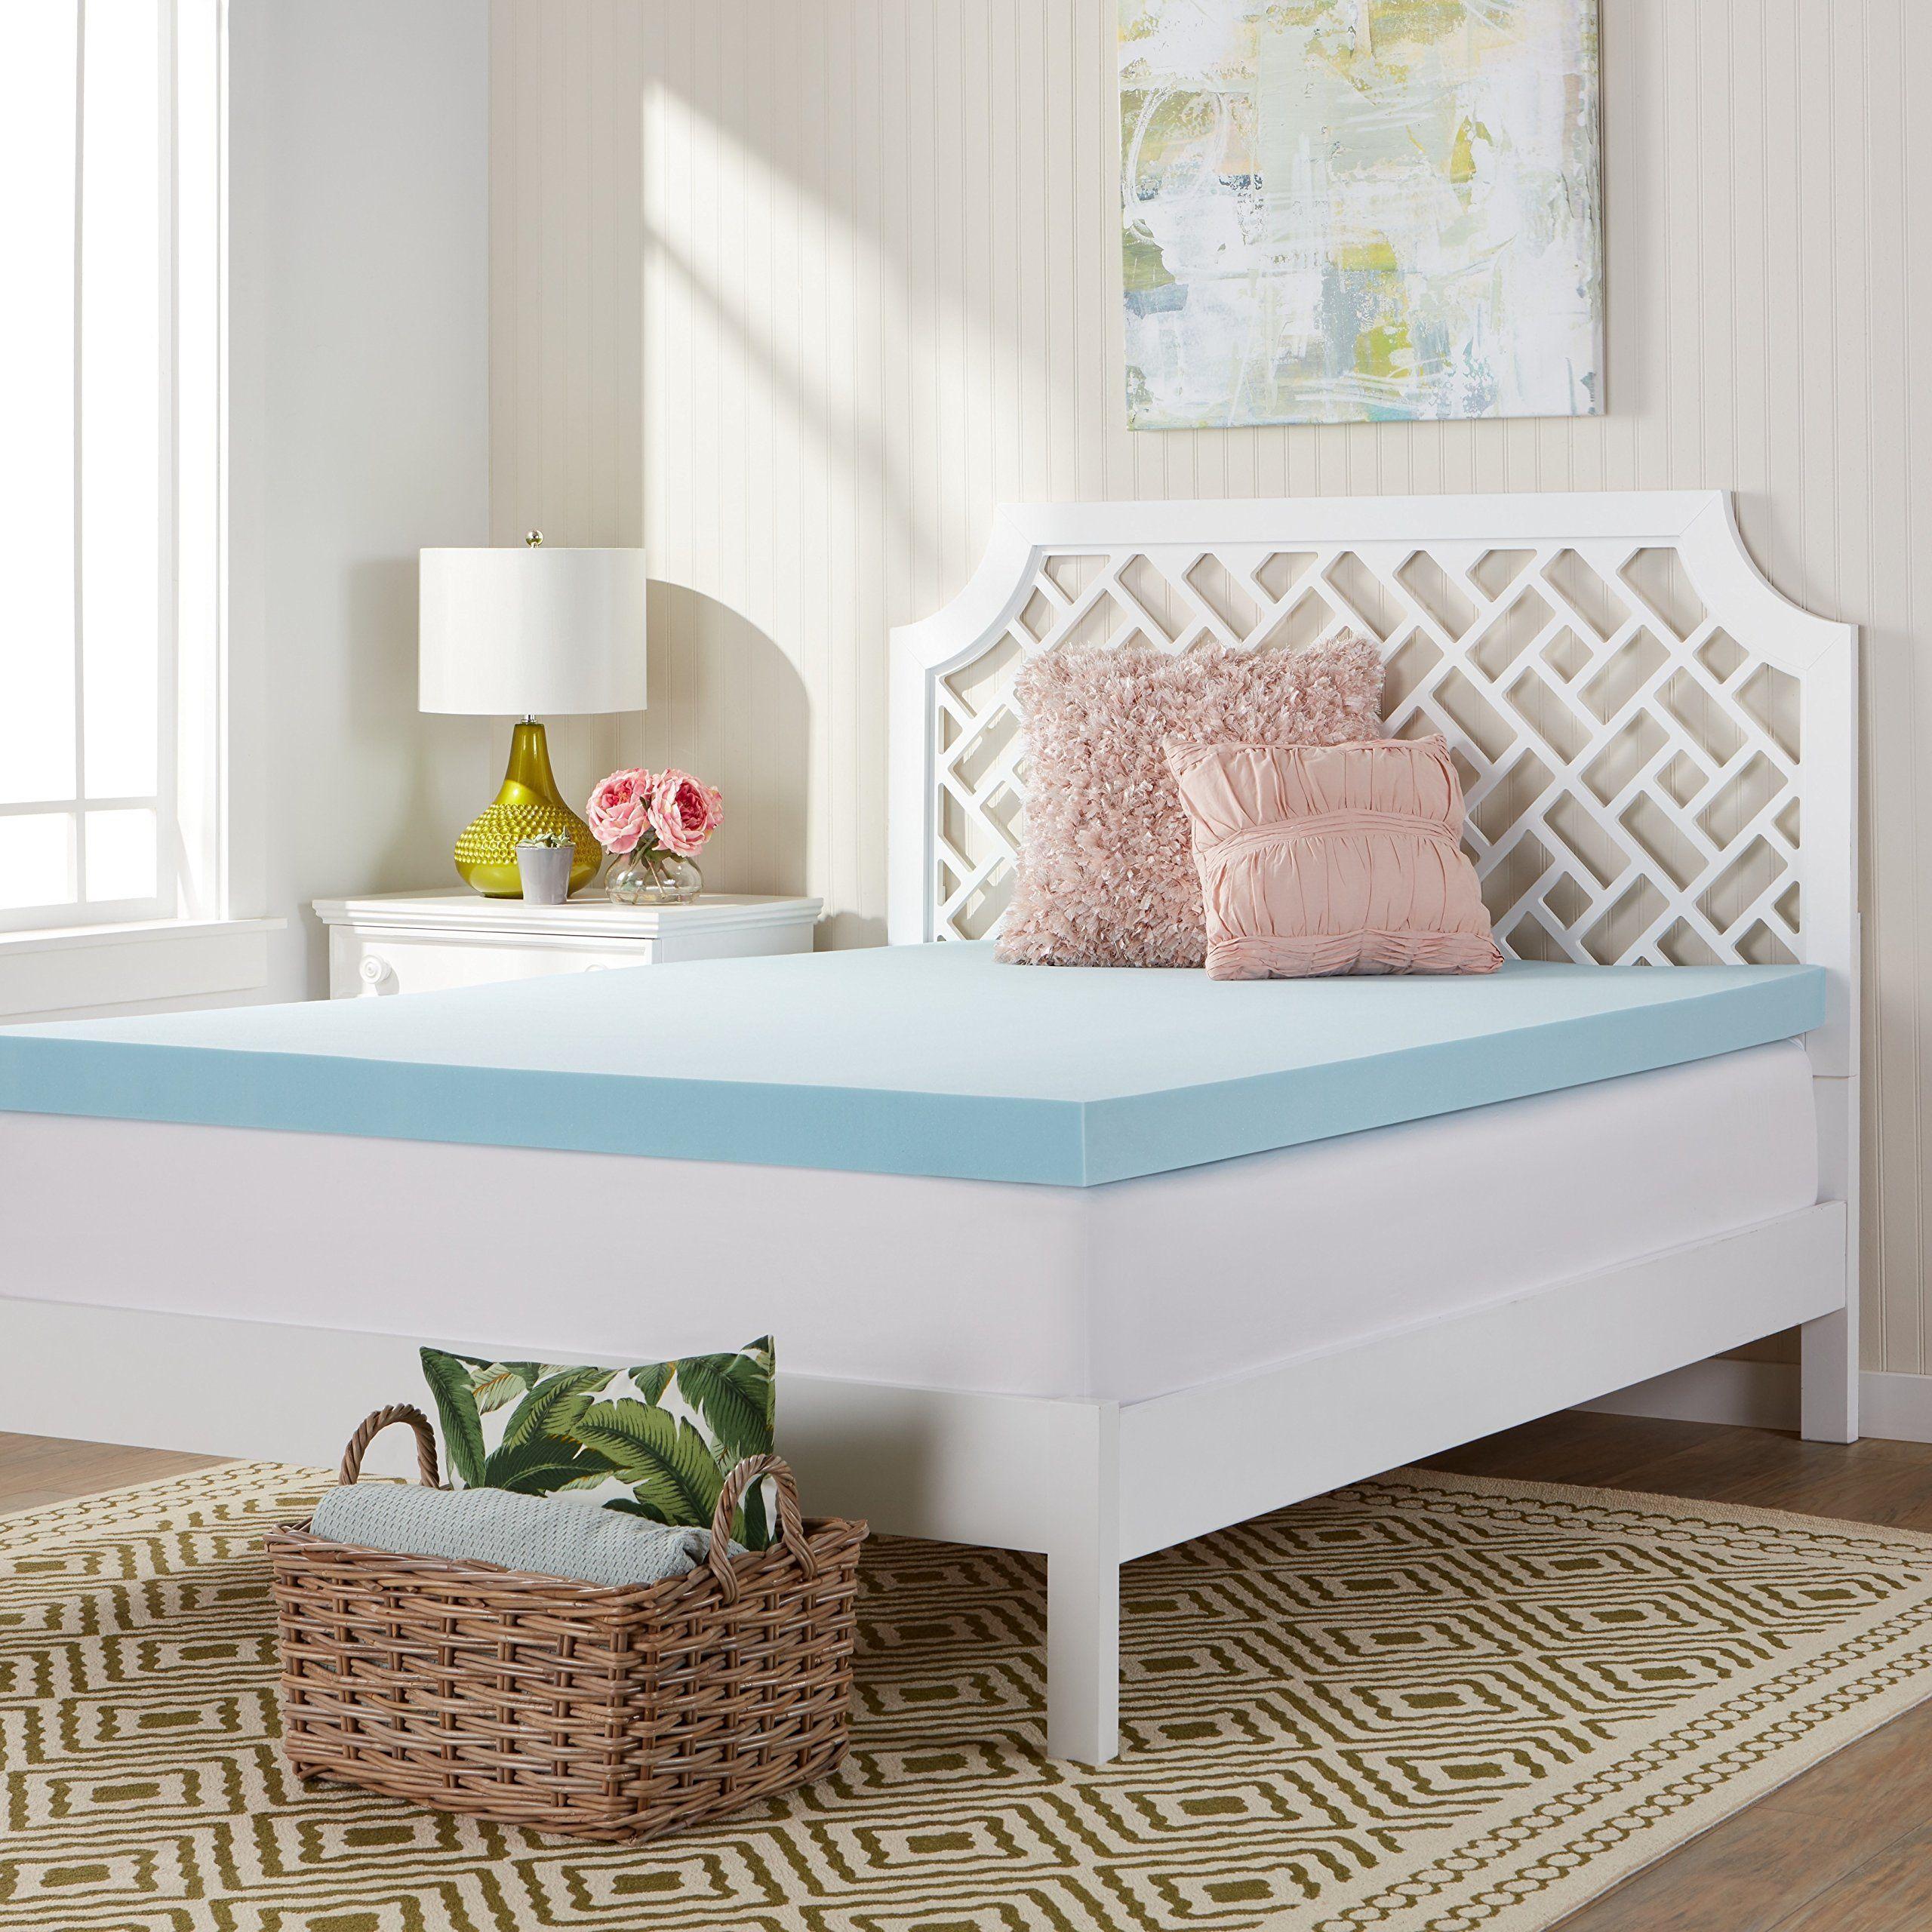 comfort dreams memcool 3inch memory foam mattress topper king